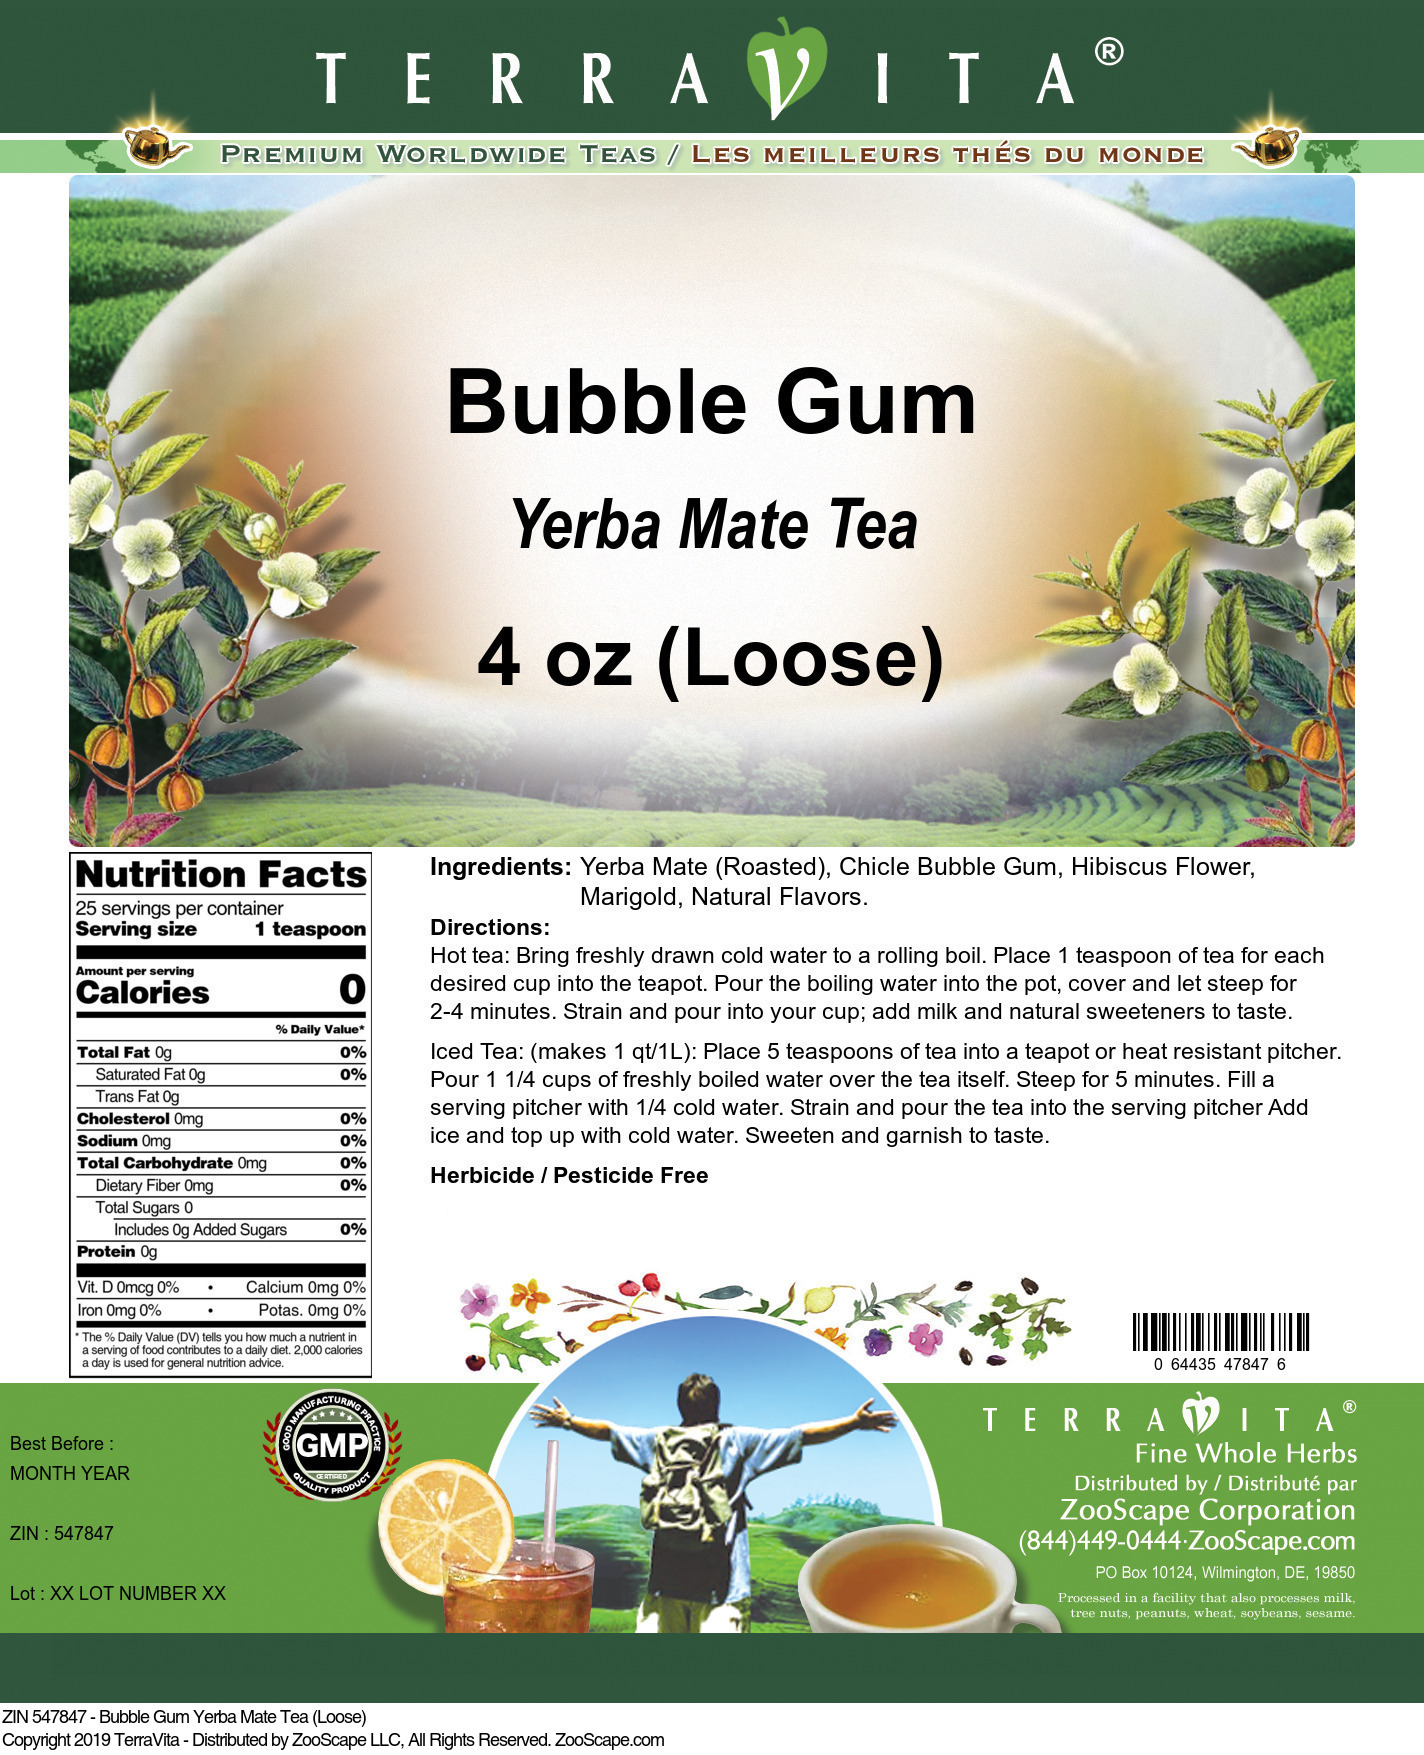 Bubble Gum Yerba Mate